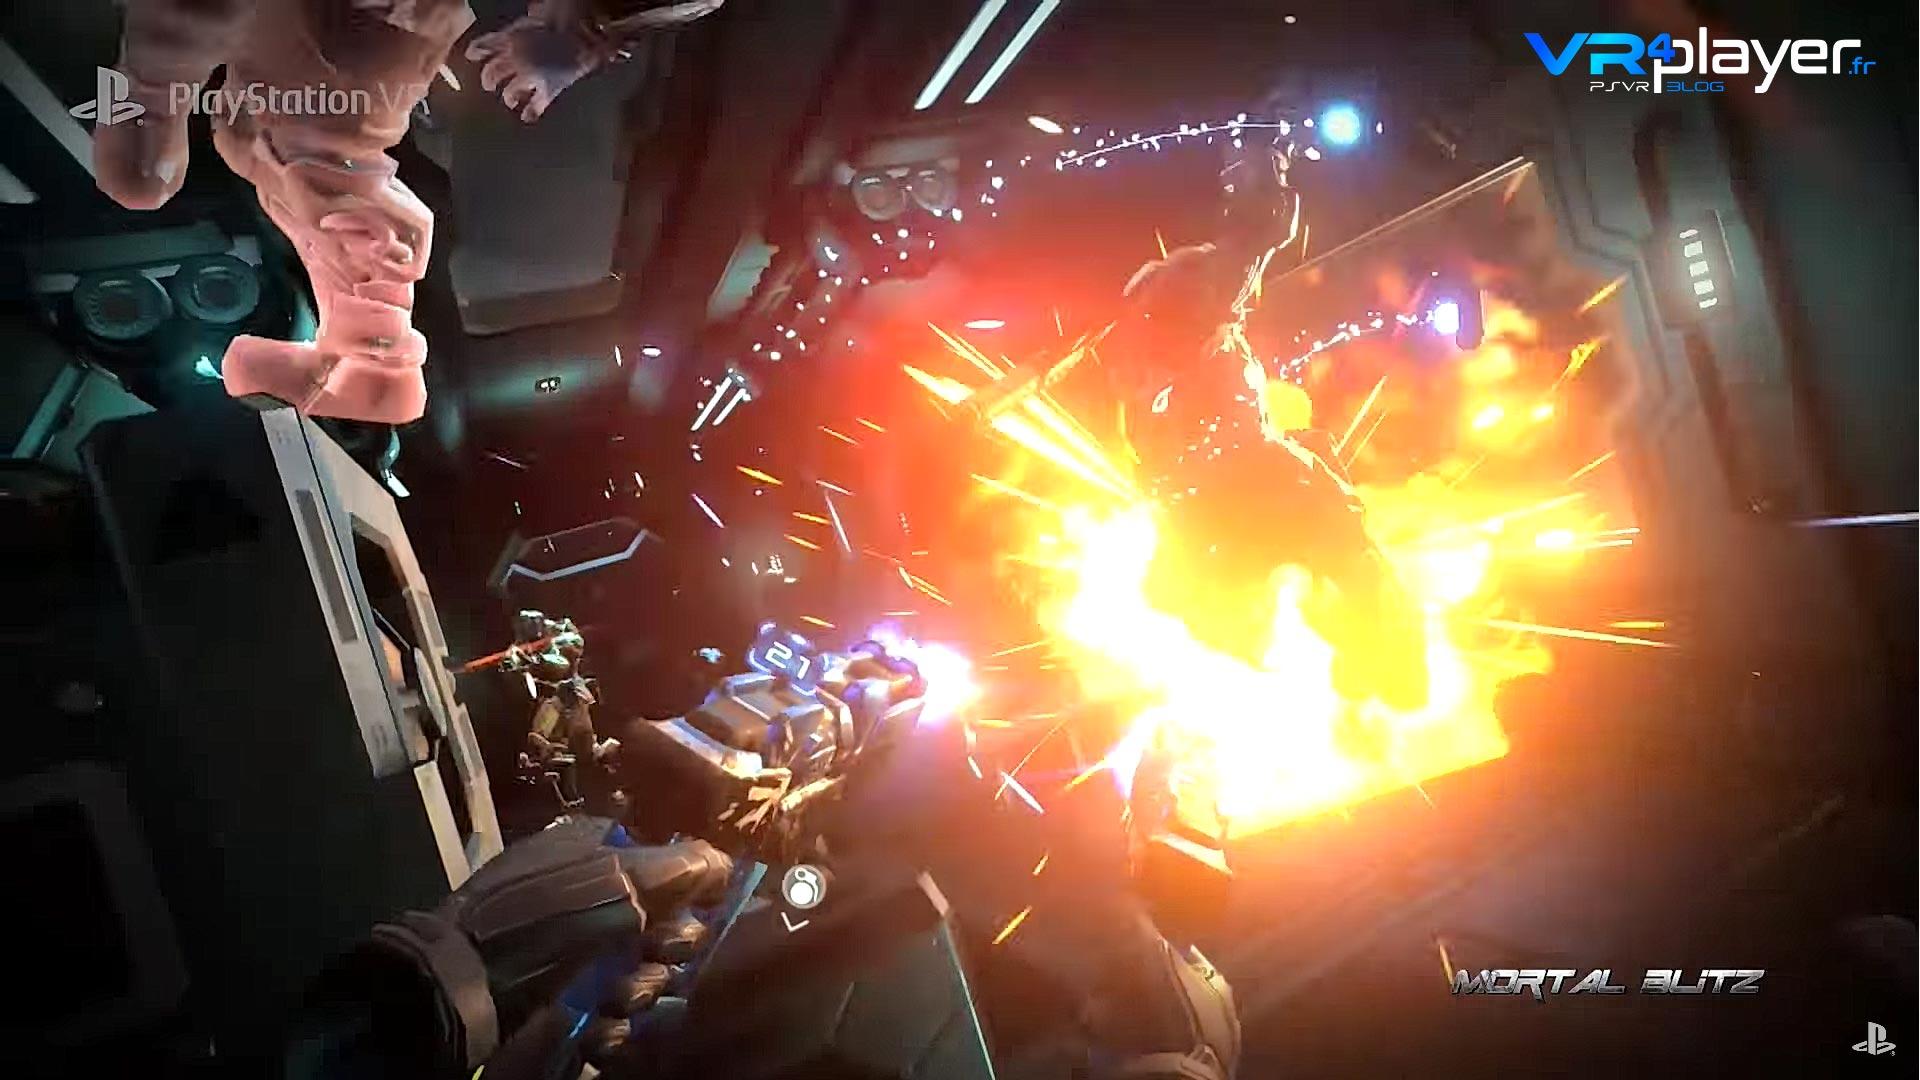 Mortal Blitz PSVR - VR4Player